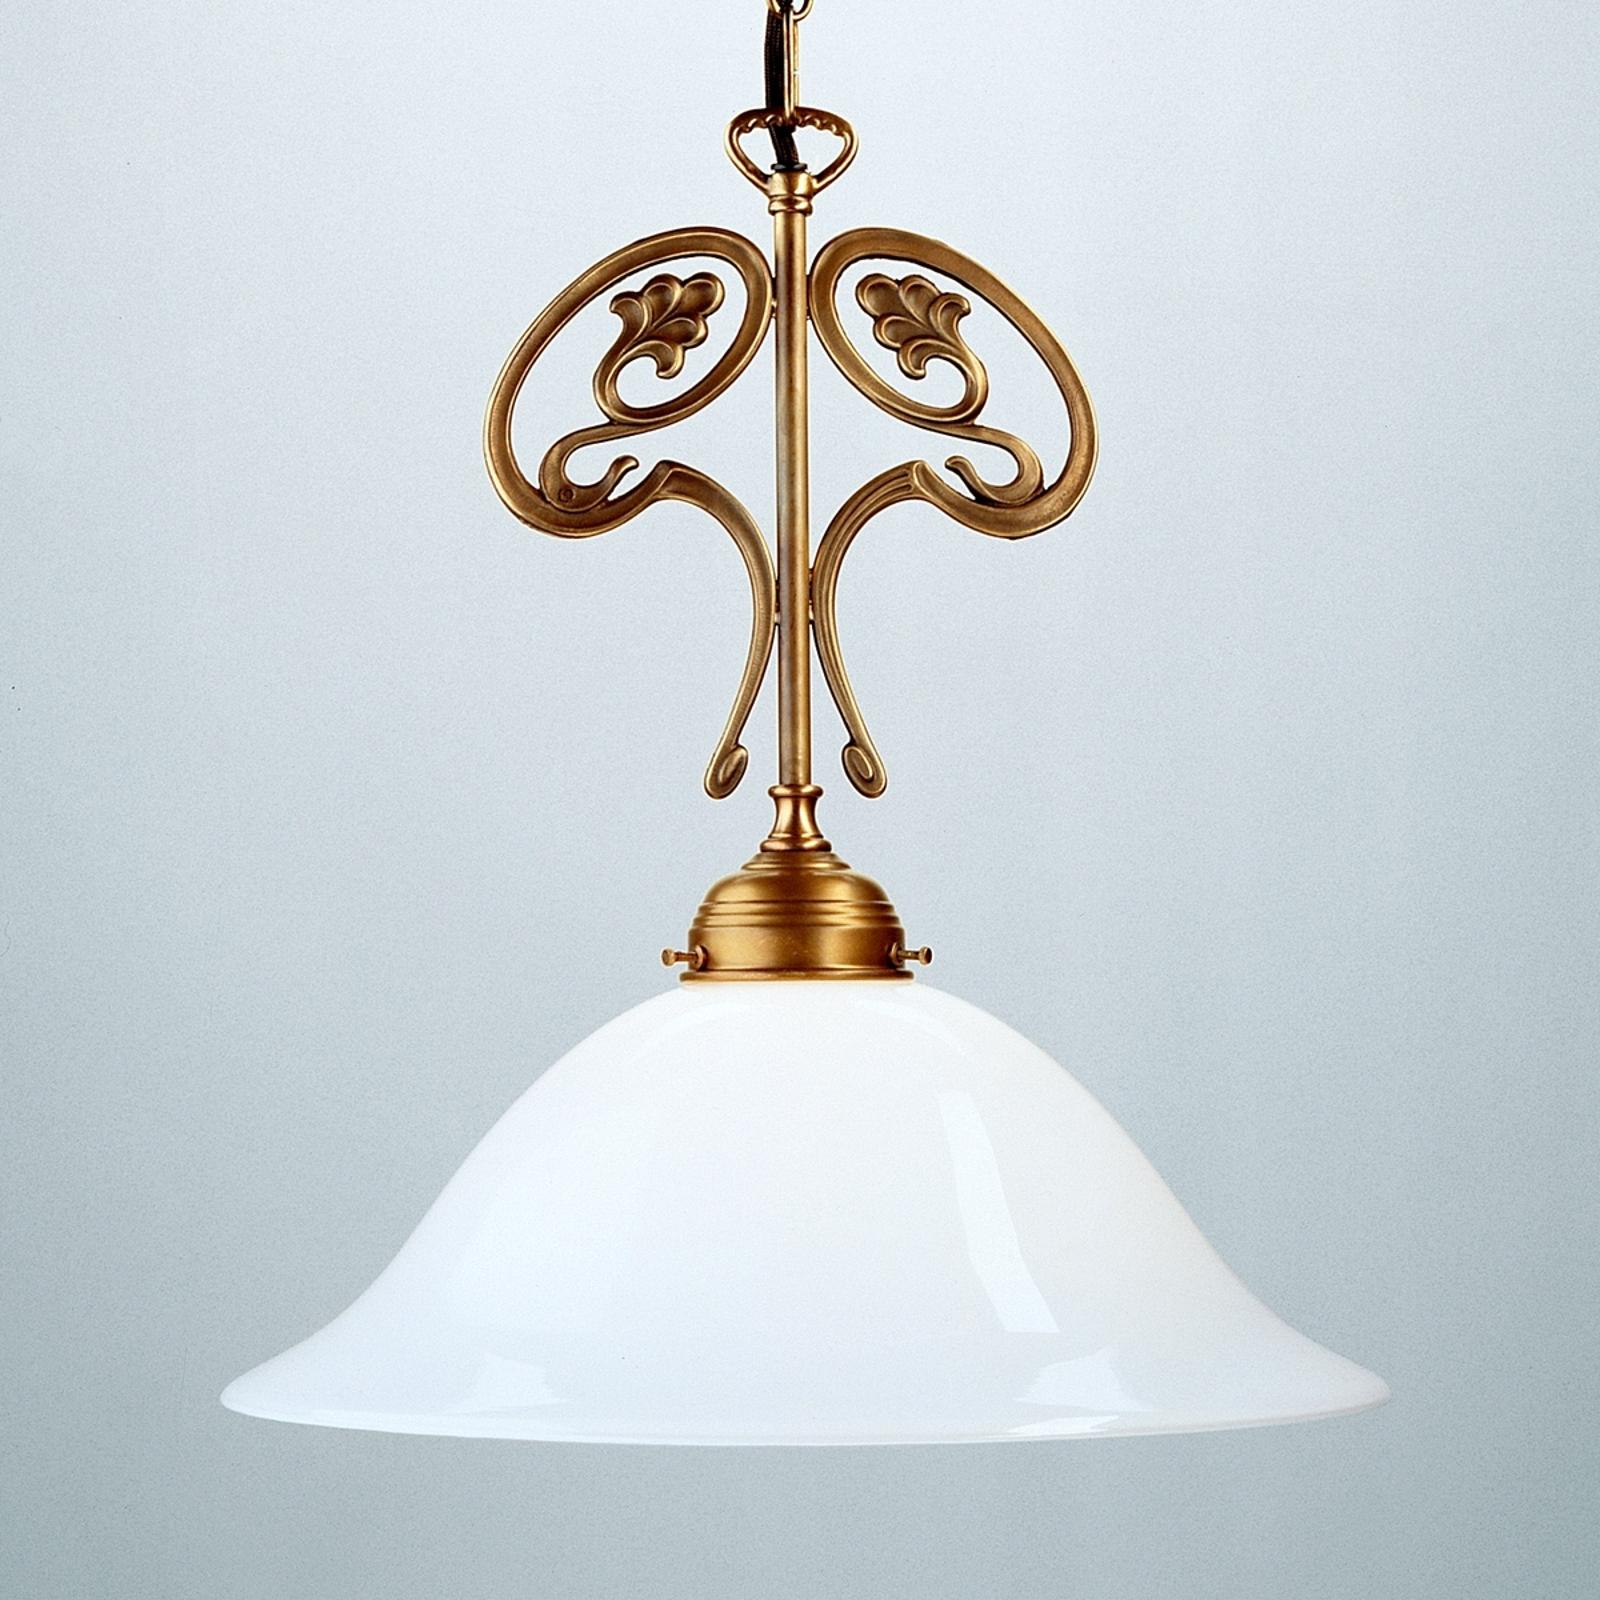 Lámpara colgante EWALD de bronce de Berlín